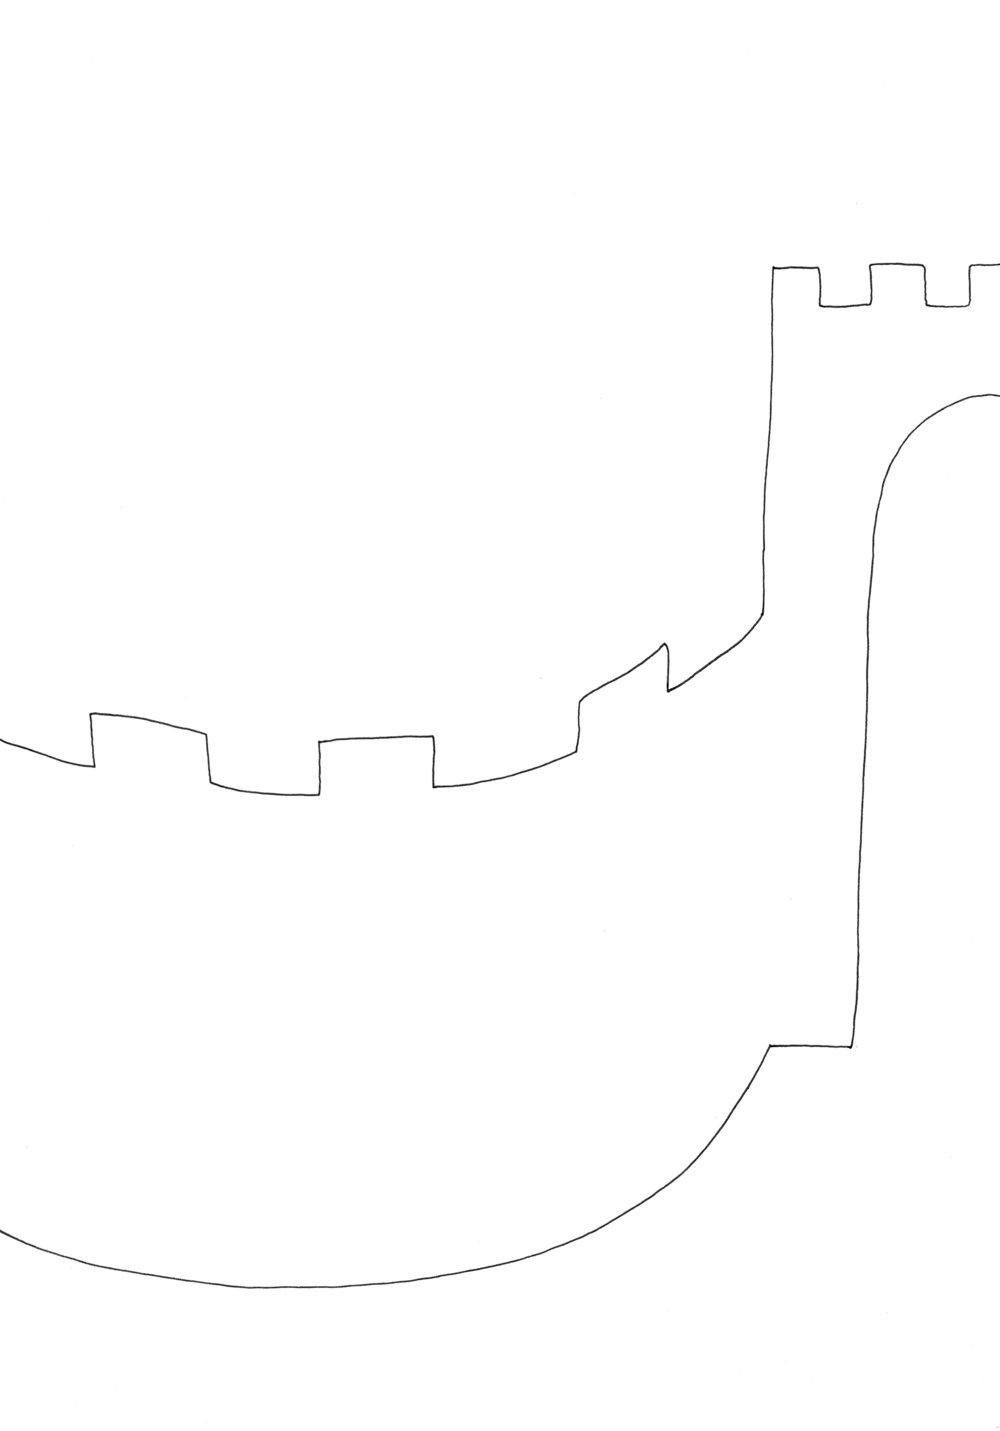 juliet furst SHP sketch 3.jpg